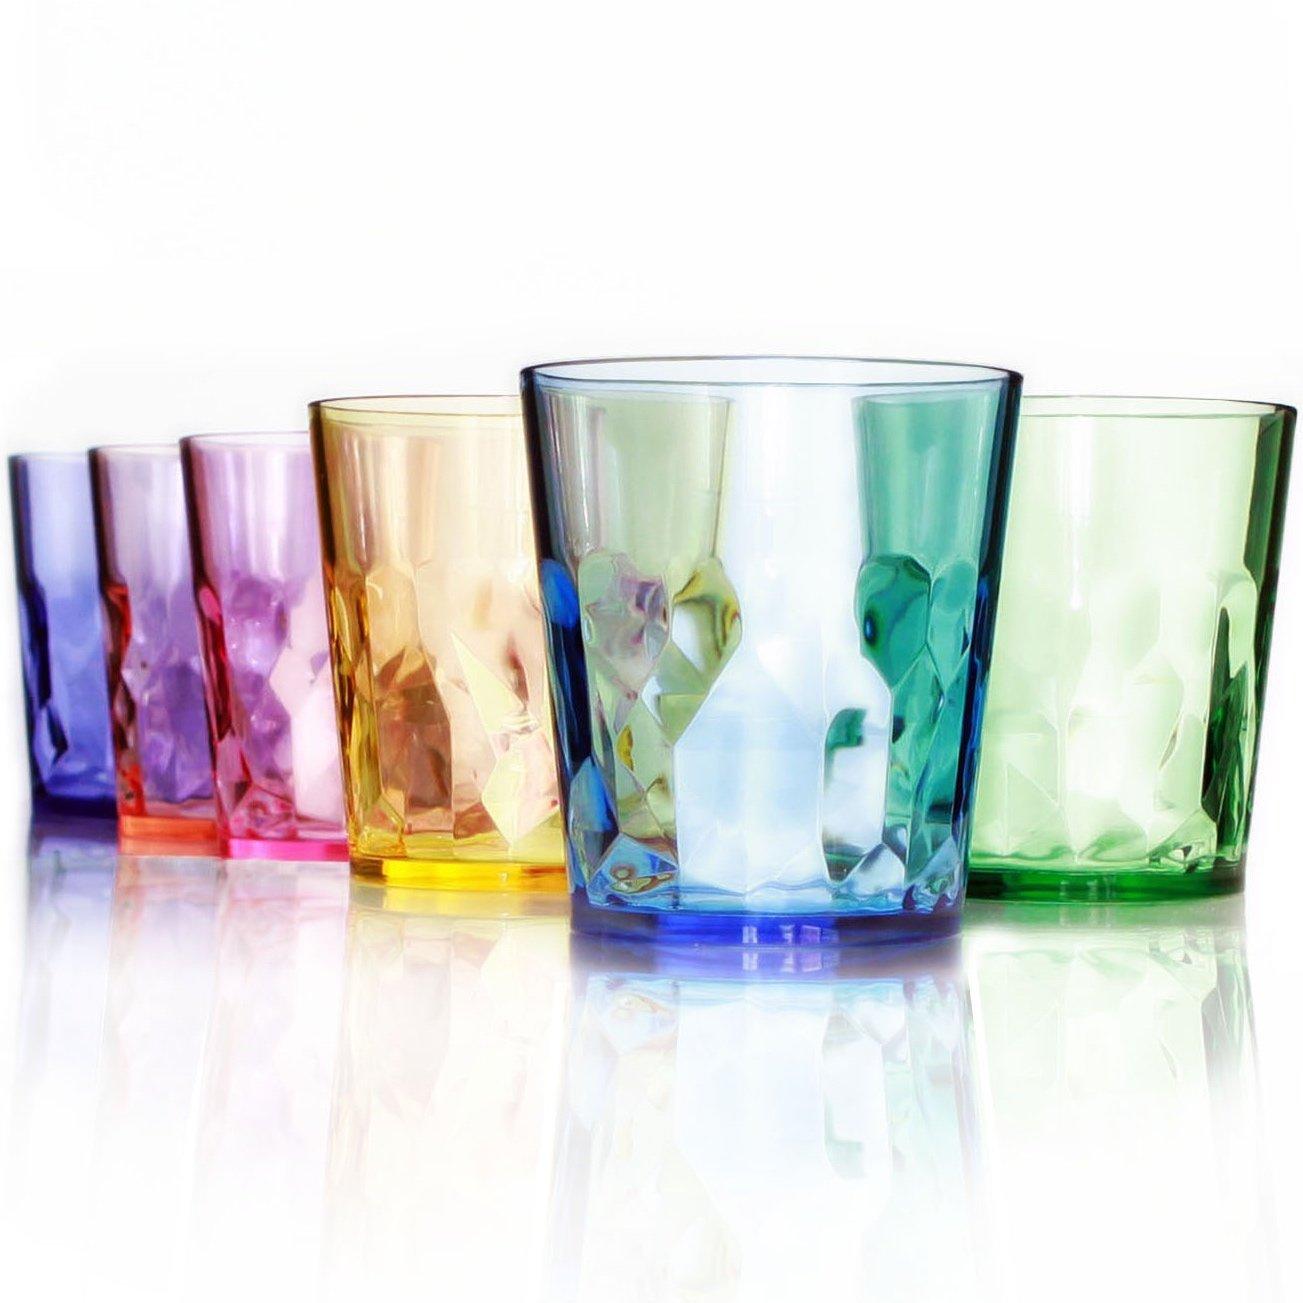 13 oz Premium Drinking Glasses - Set of 6 - Unbreakable Tritan Plastic - BPA Free - 100% Made in Japan (Assorted Colors) CT-11